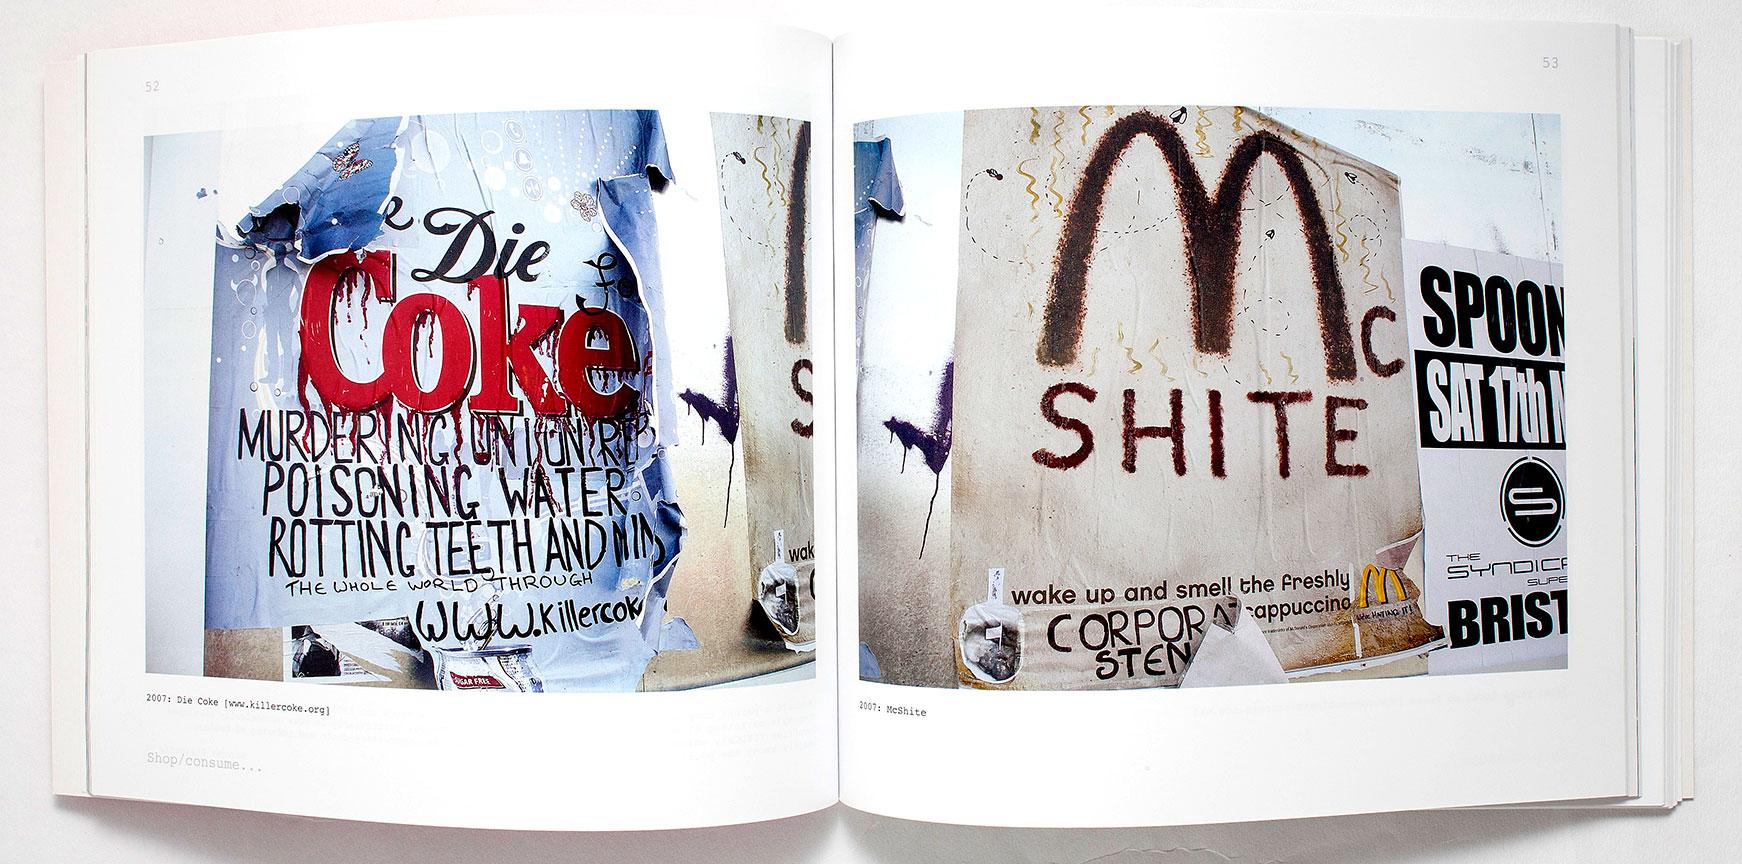 epm-print-management-political-books-don-pedro-5.jpg